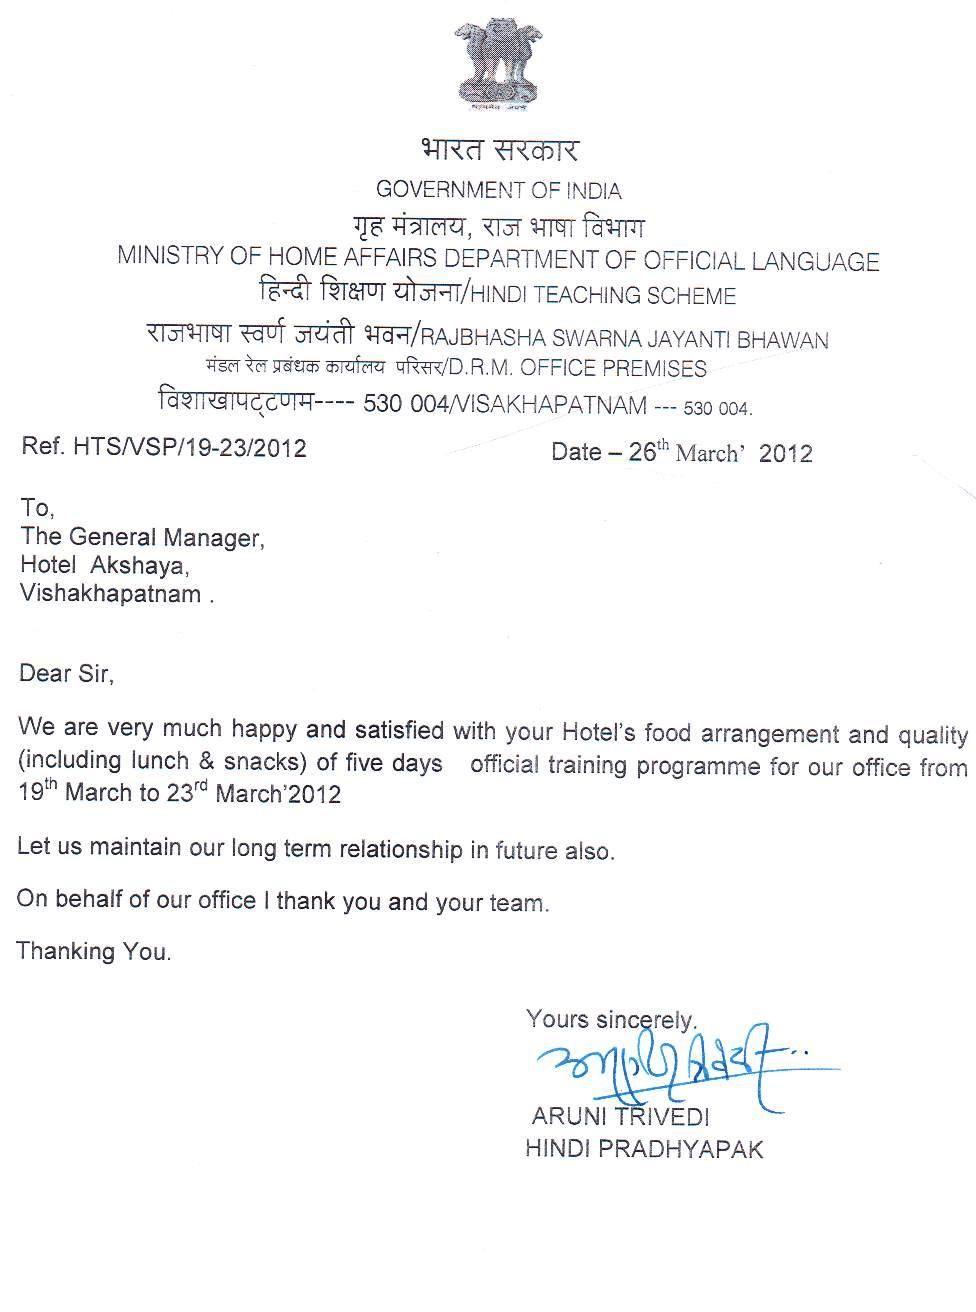 Pin On Letter Of Appreciation Appreciation Hotelakshaya Air force letter of appreciation template